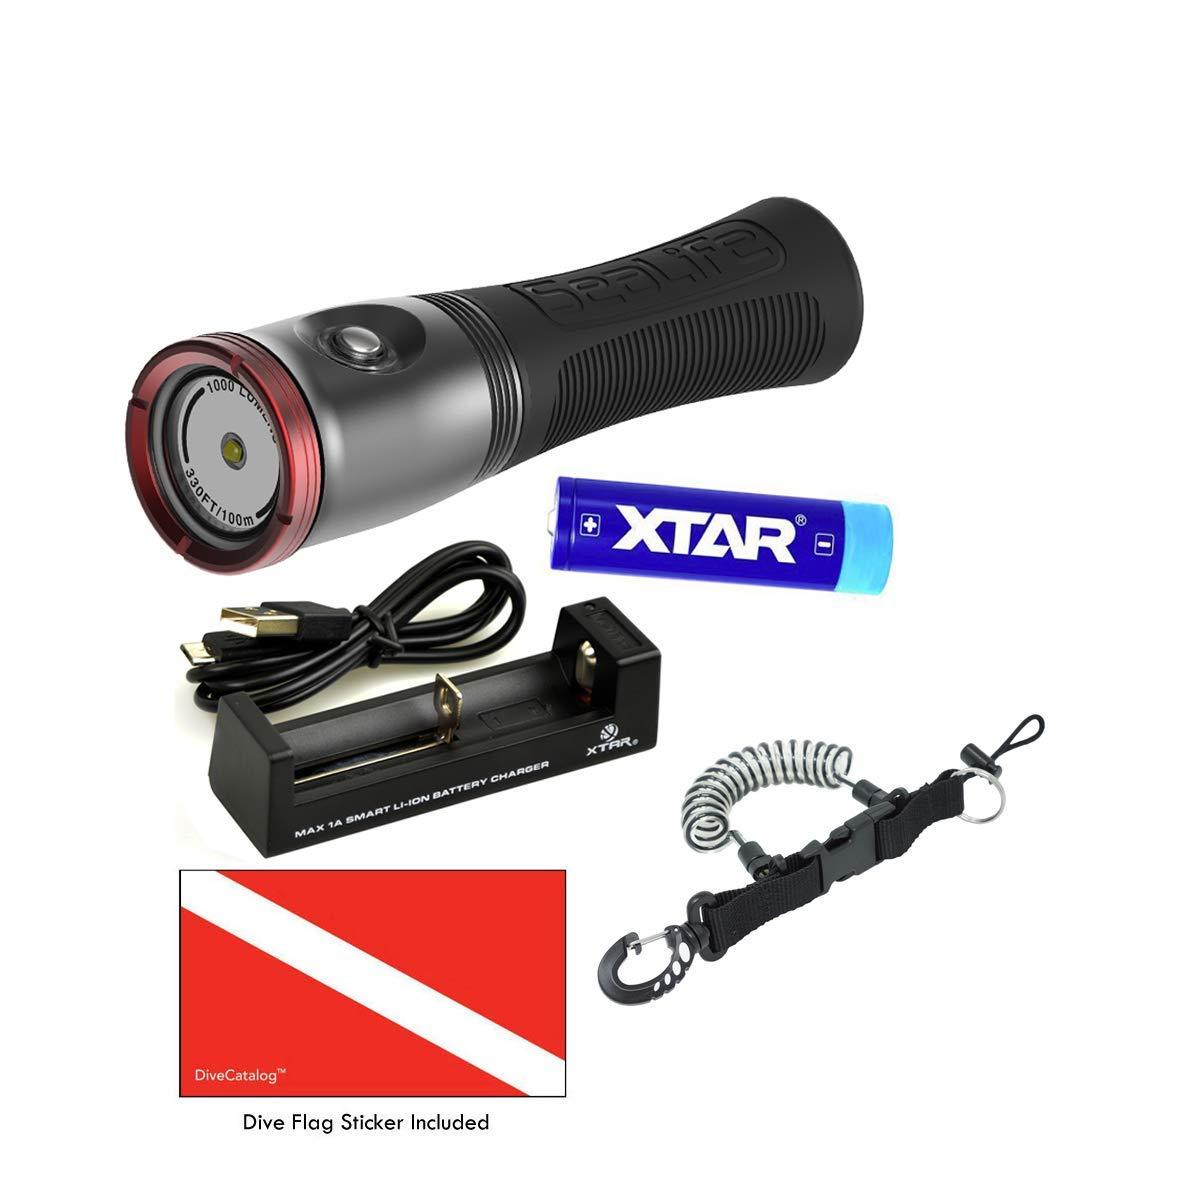 SeaLife Sea Dragon 1000F Photo/Video Light Head Power Kit (SLKITO7 w DiveCatalog's Coil Lanyard and Sticker)